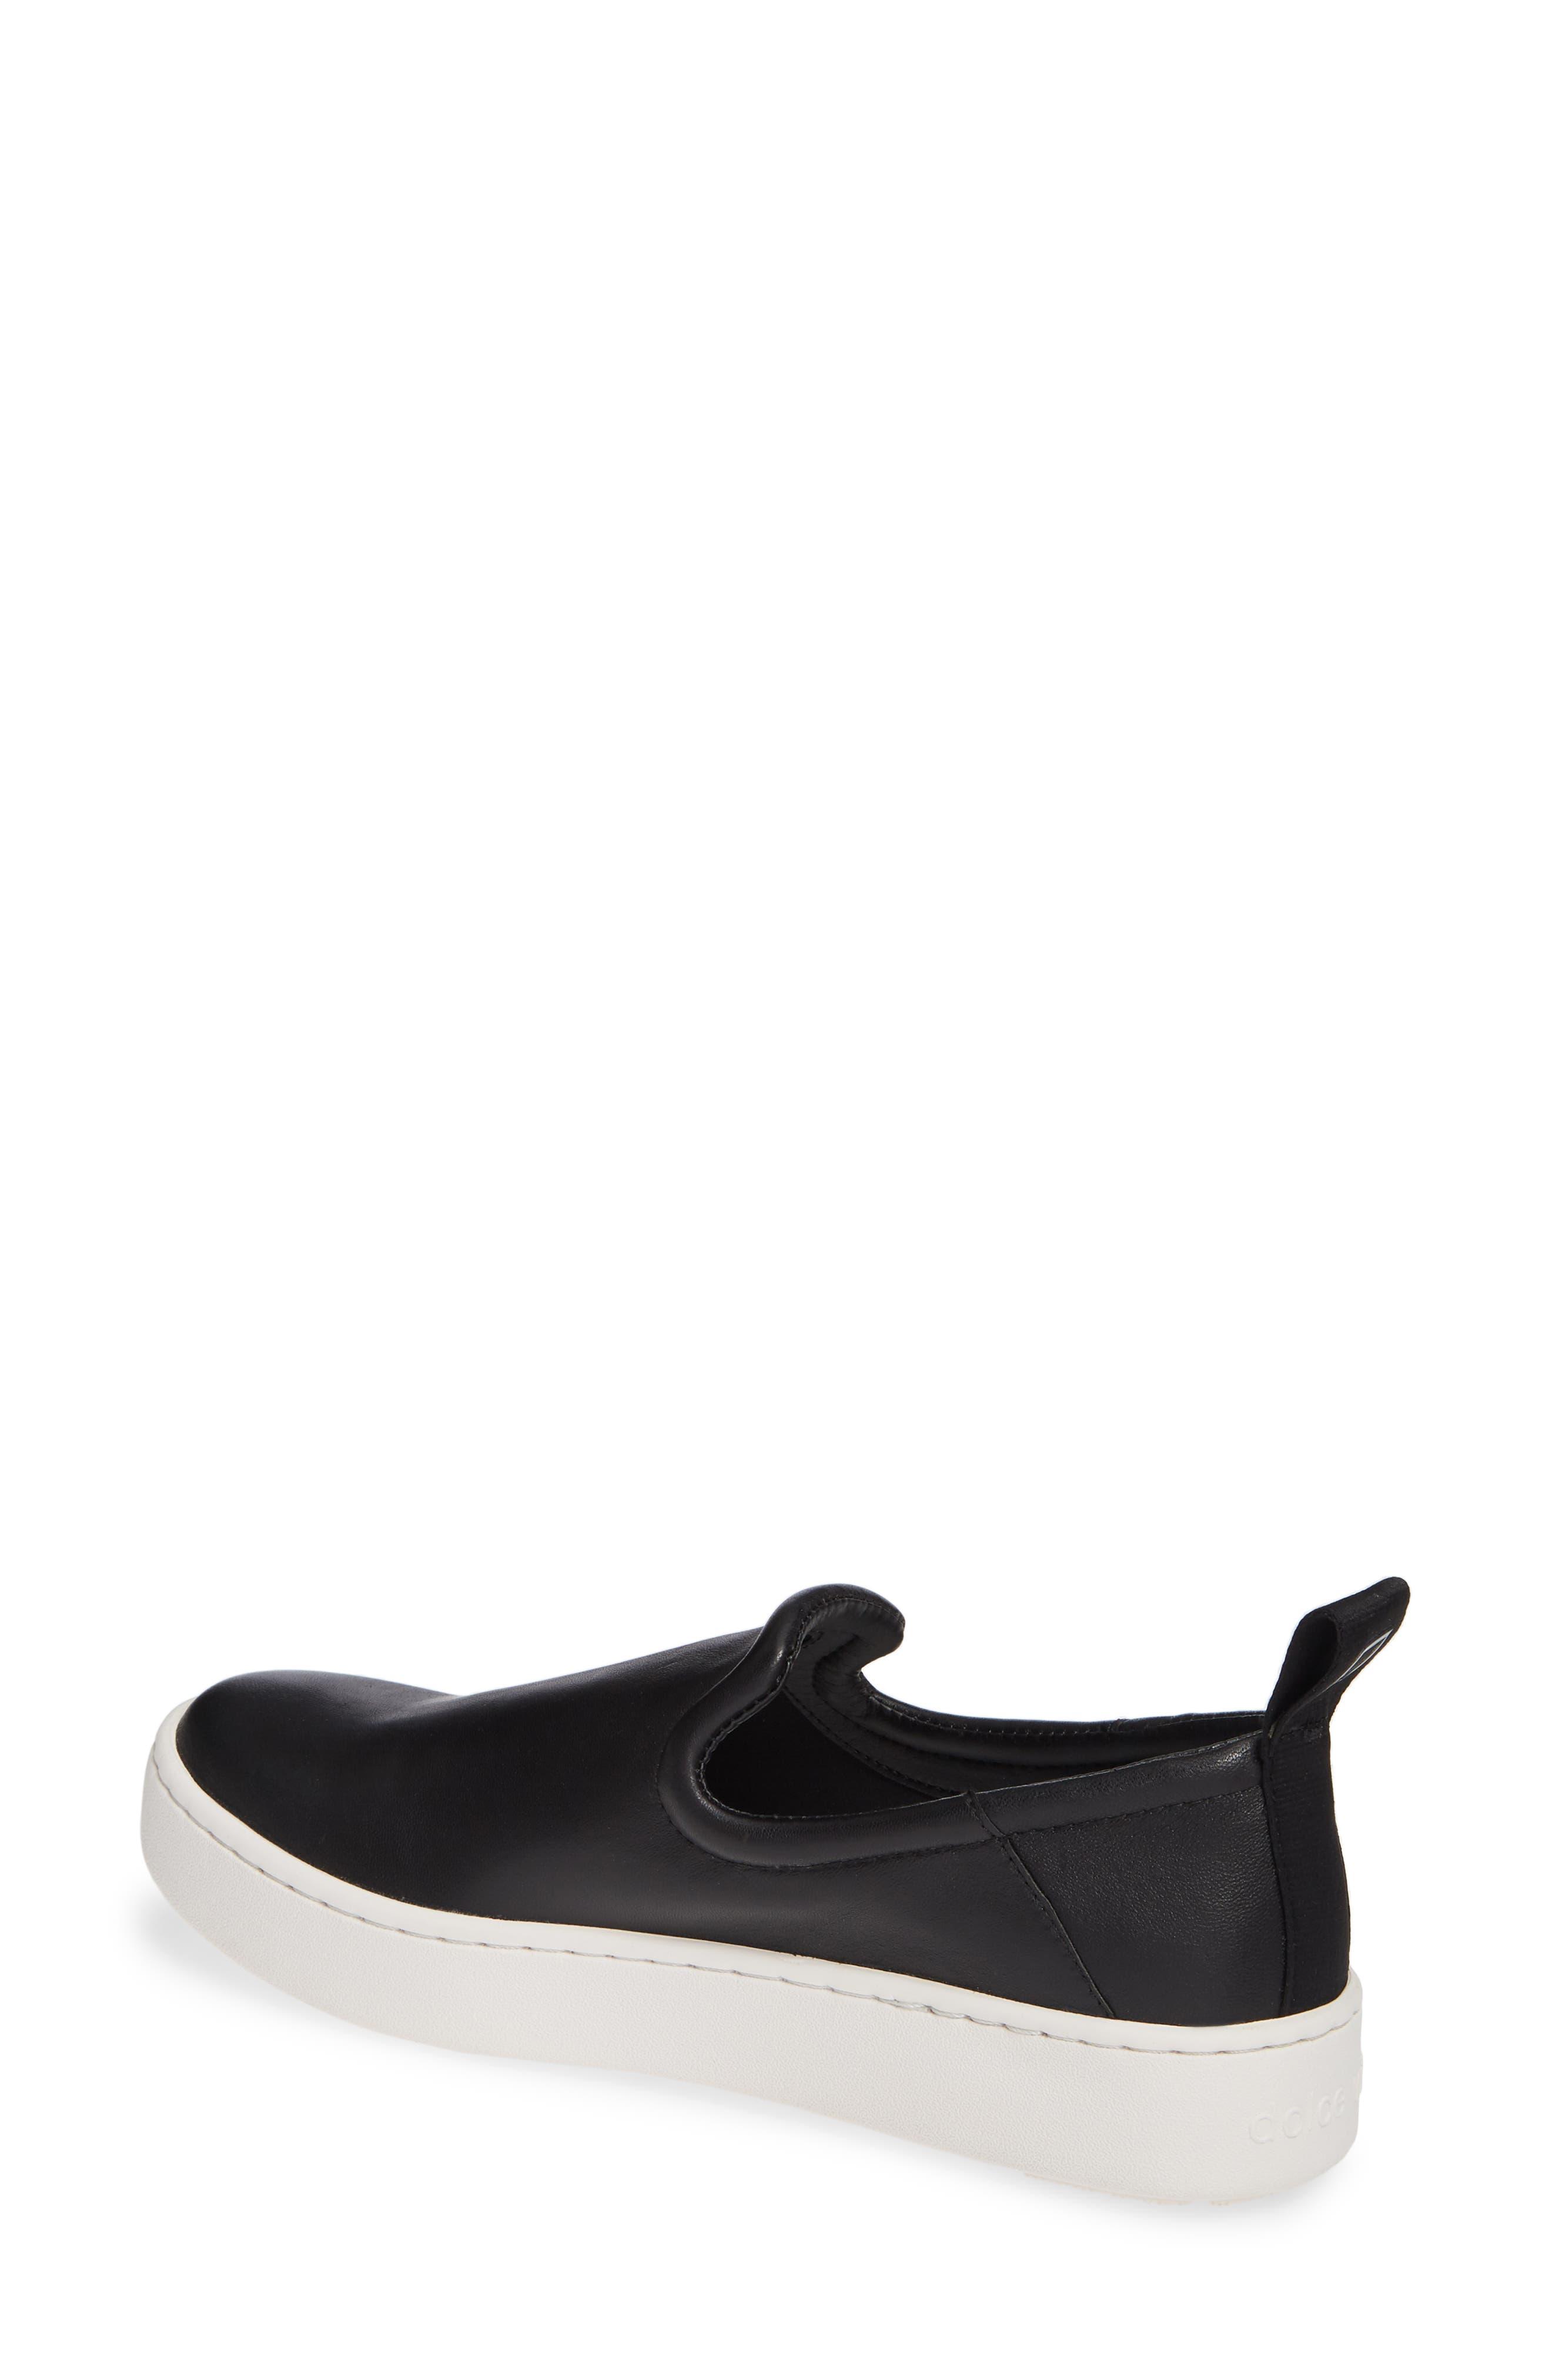 DOLCE VITA, Tag Slip-On Sneaker, Alternate thumbnail 2, color, BLACK LEATHER